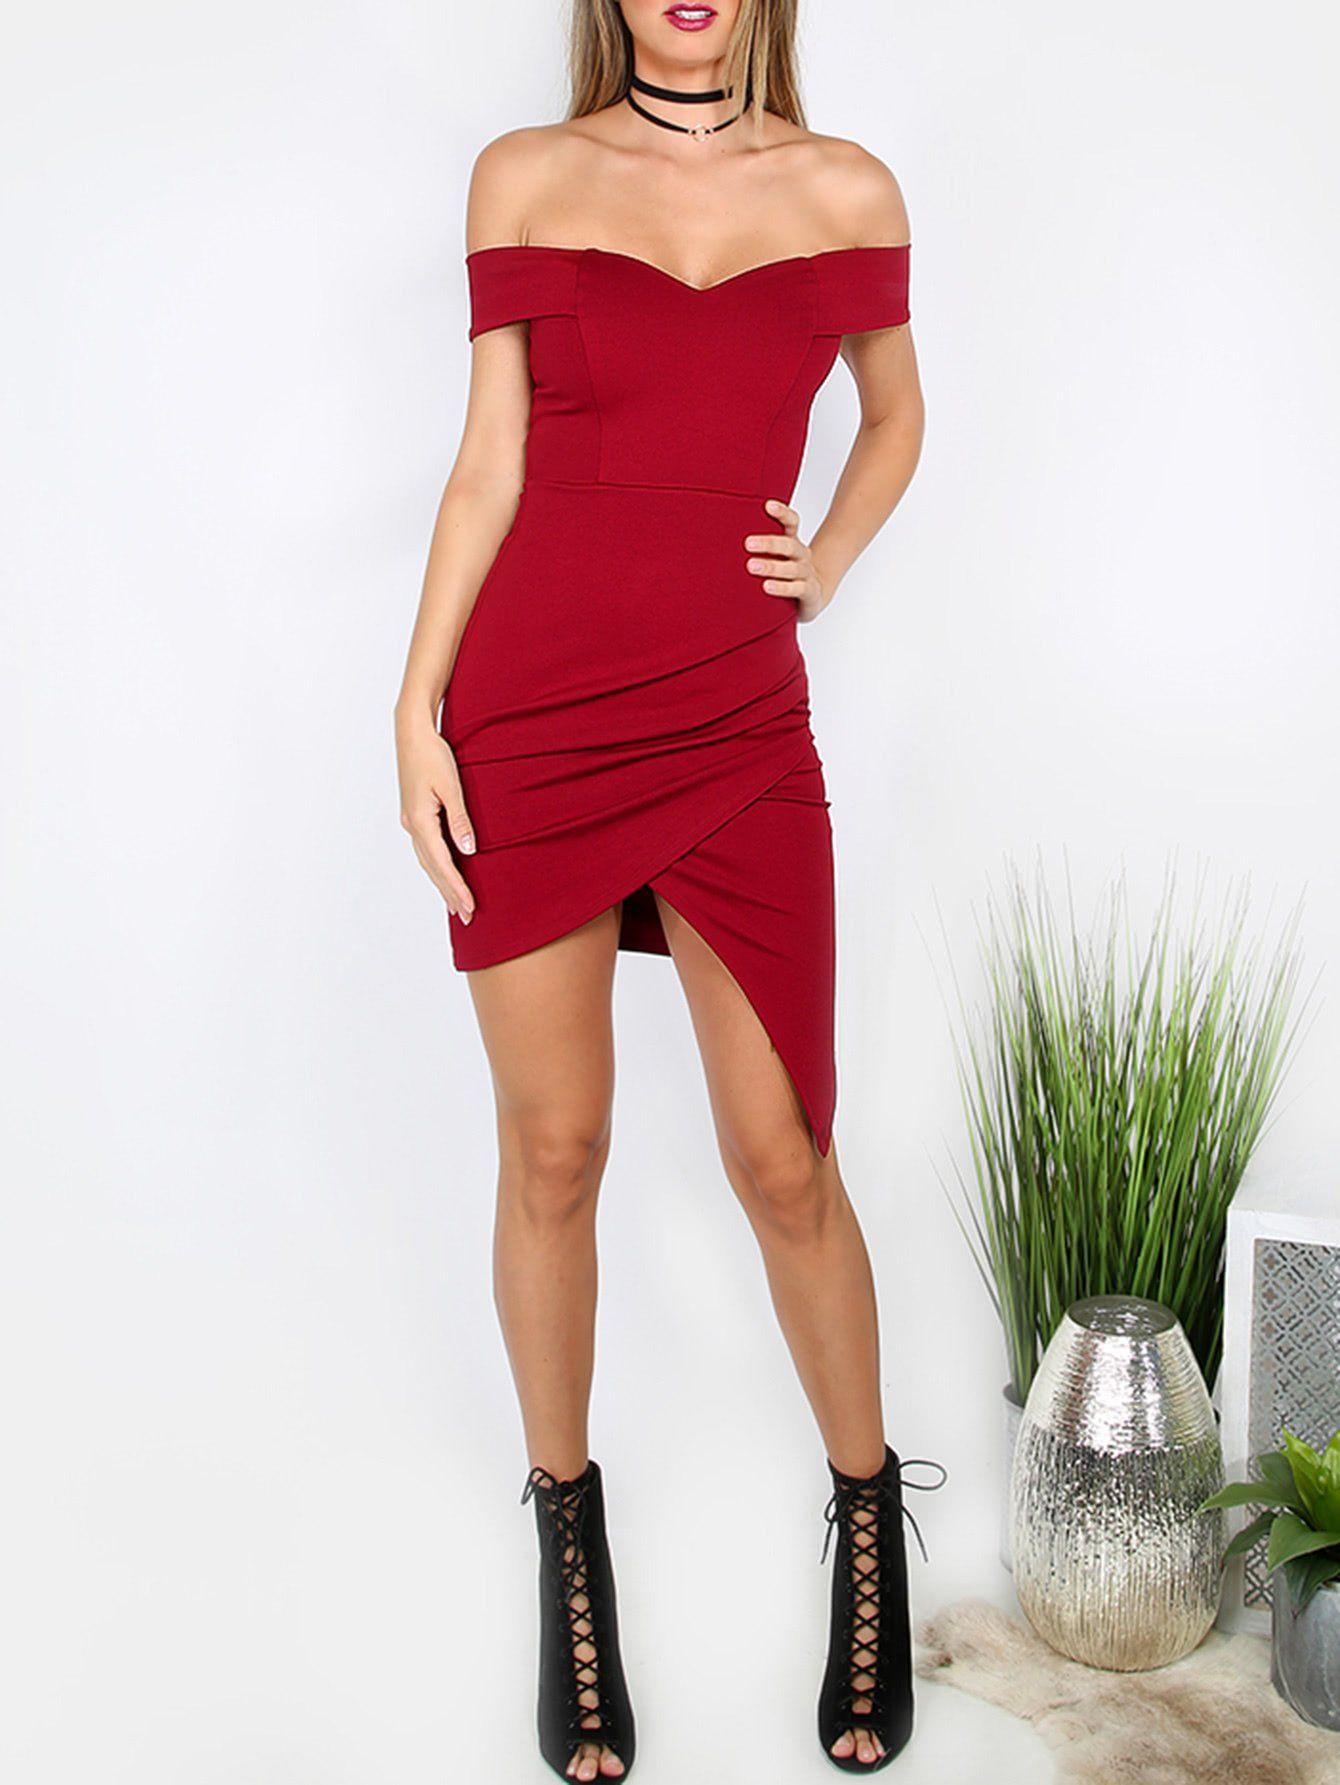 Sweetheart off shoulder asymmetrical bodycon dress bodycon dress